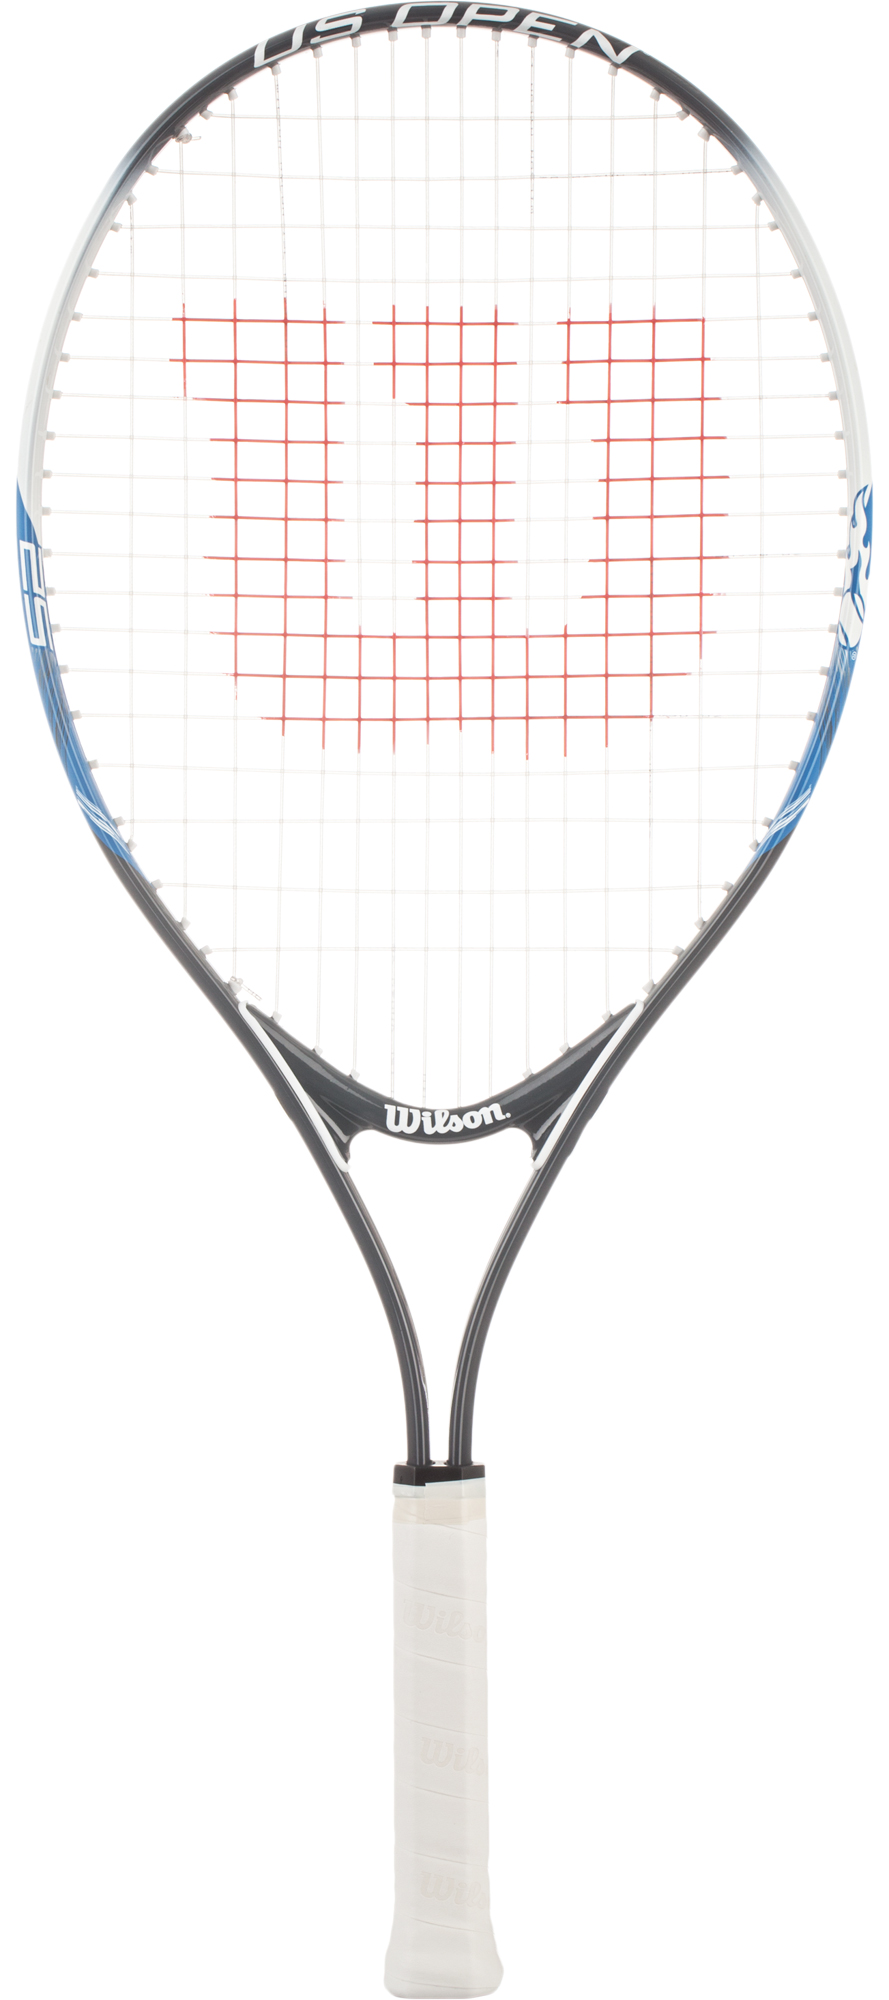 Wilson Ракетка для большого тенниса детская Wilson US Open 25, размер Без размера wilson набор мячей для большого тенниса wilson us open x3 размер без размера